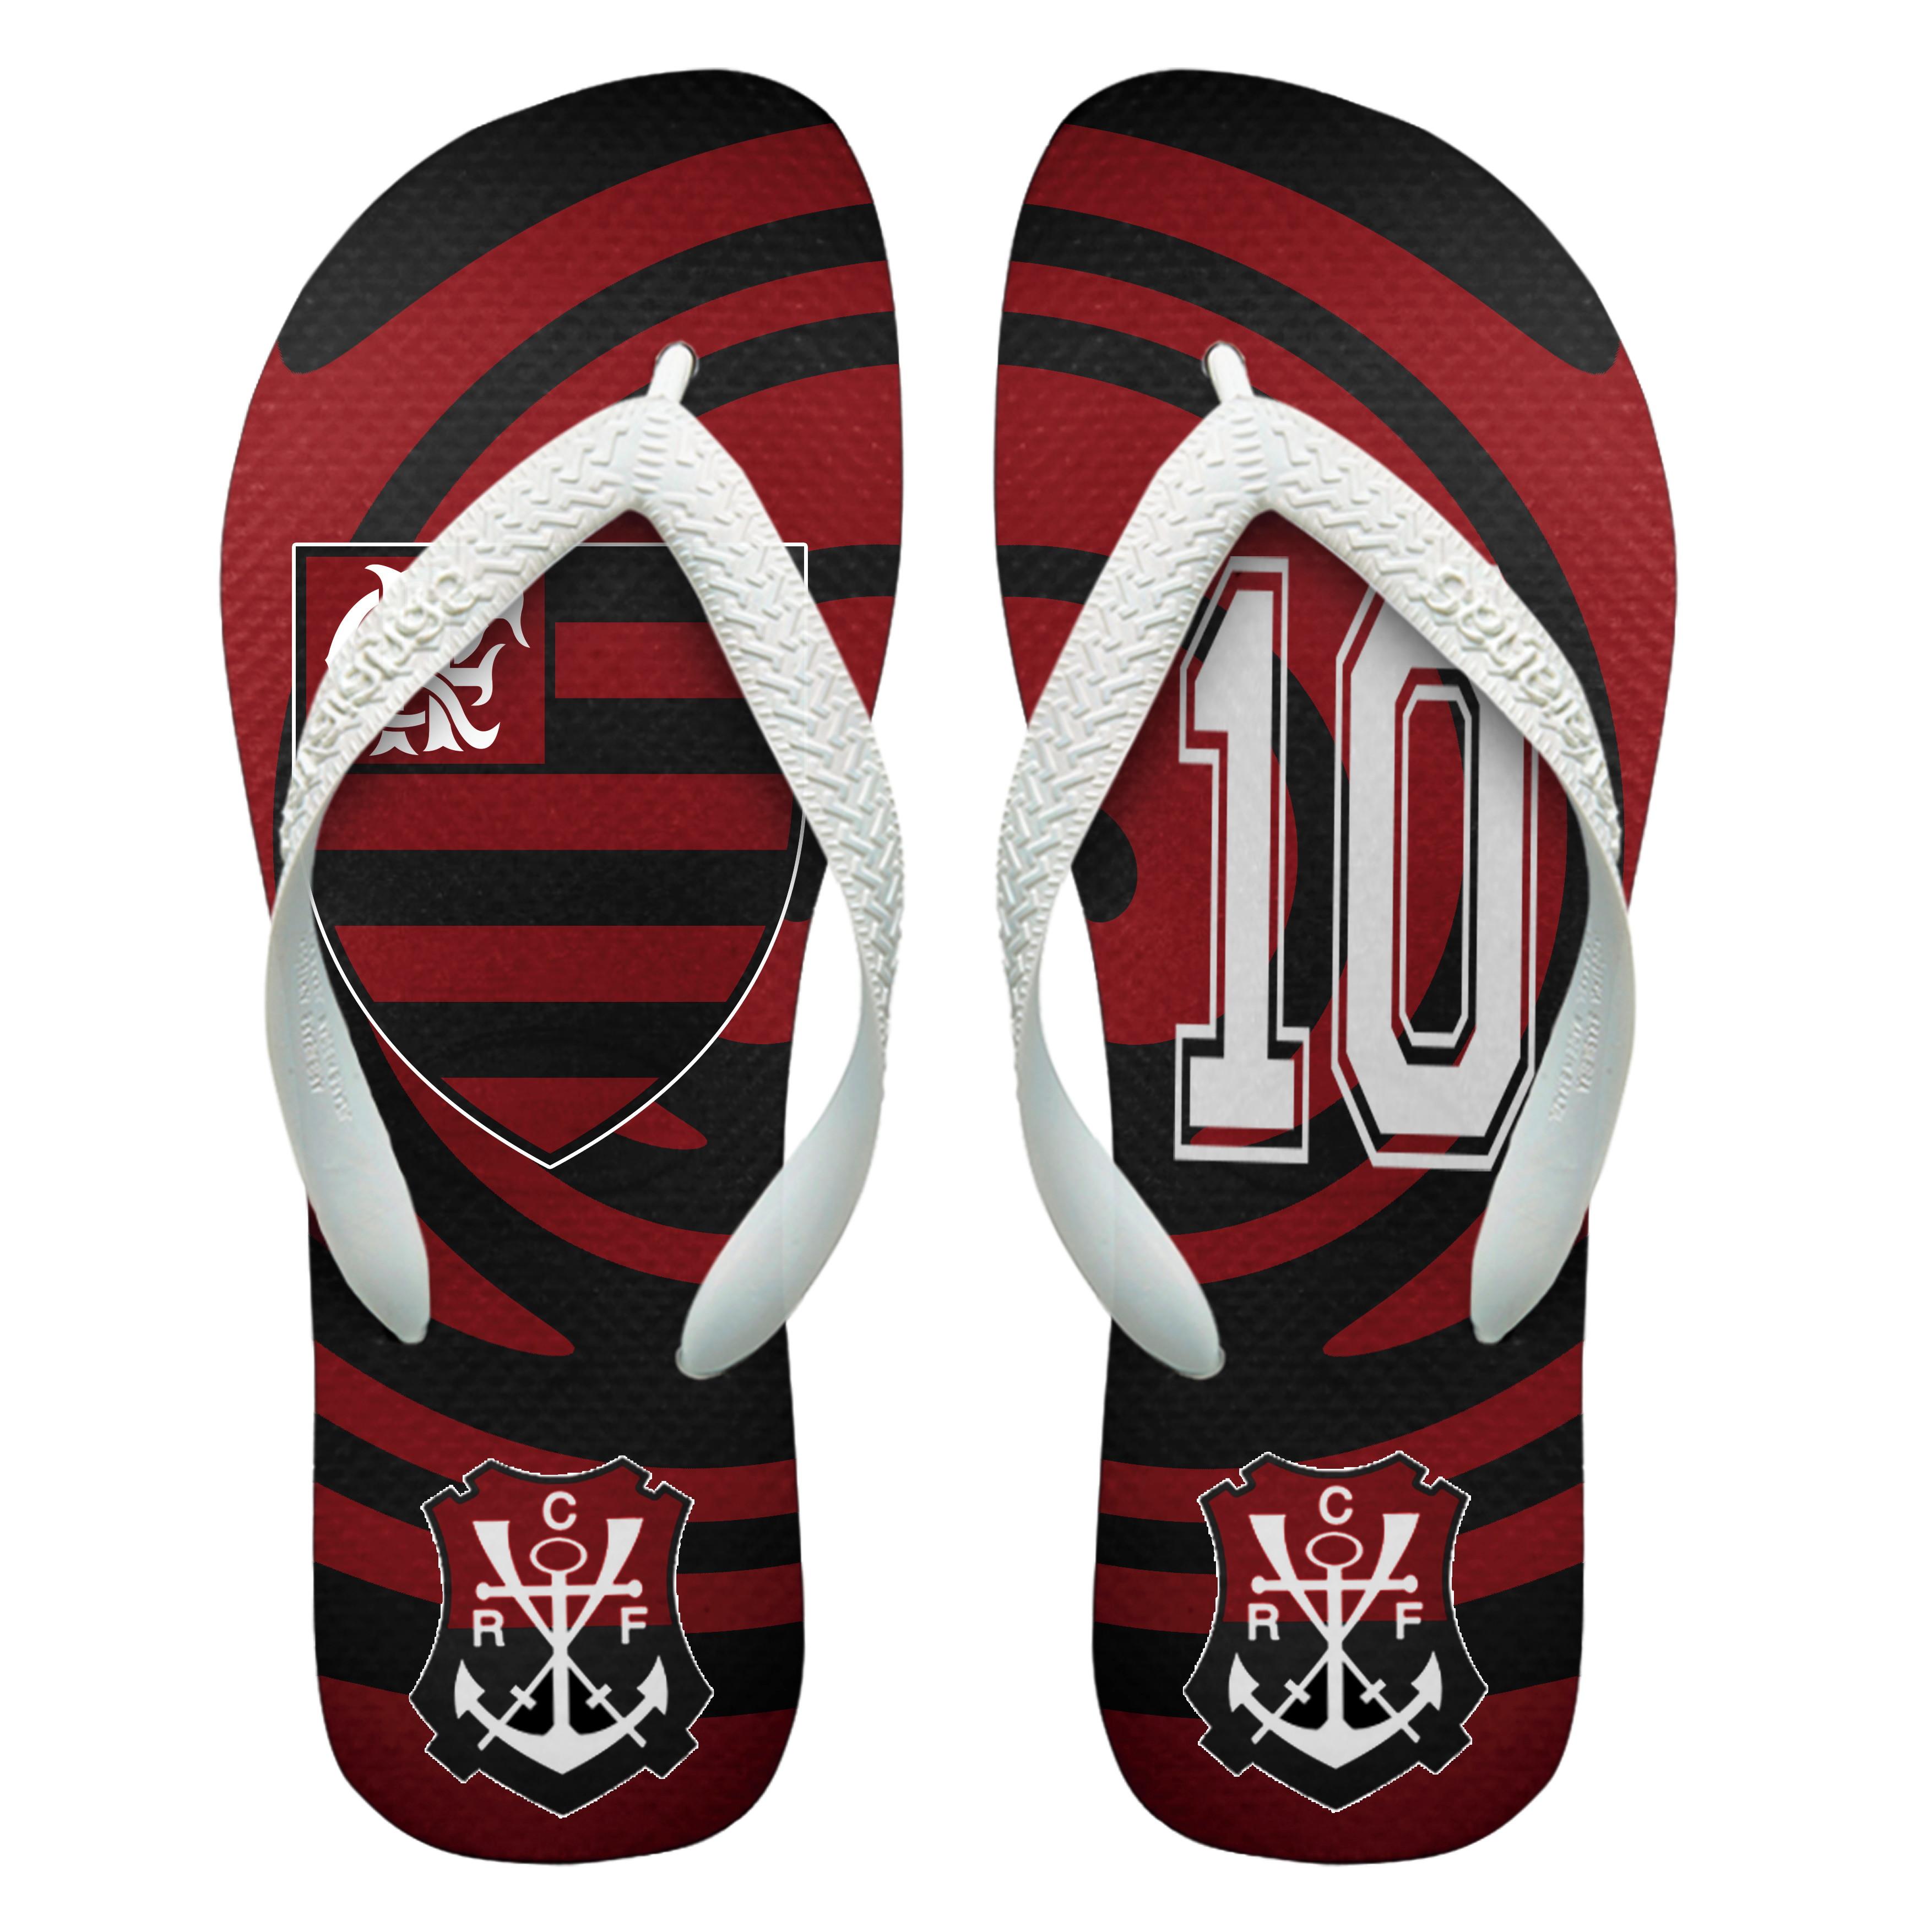 f5c9034b16b692 Chinelos Personalizados Havaianas Flamengo [4]